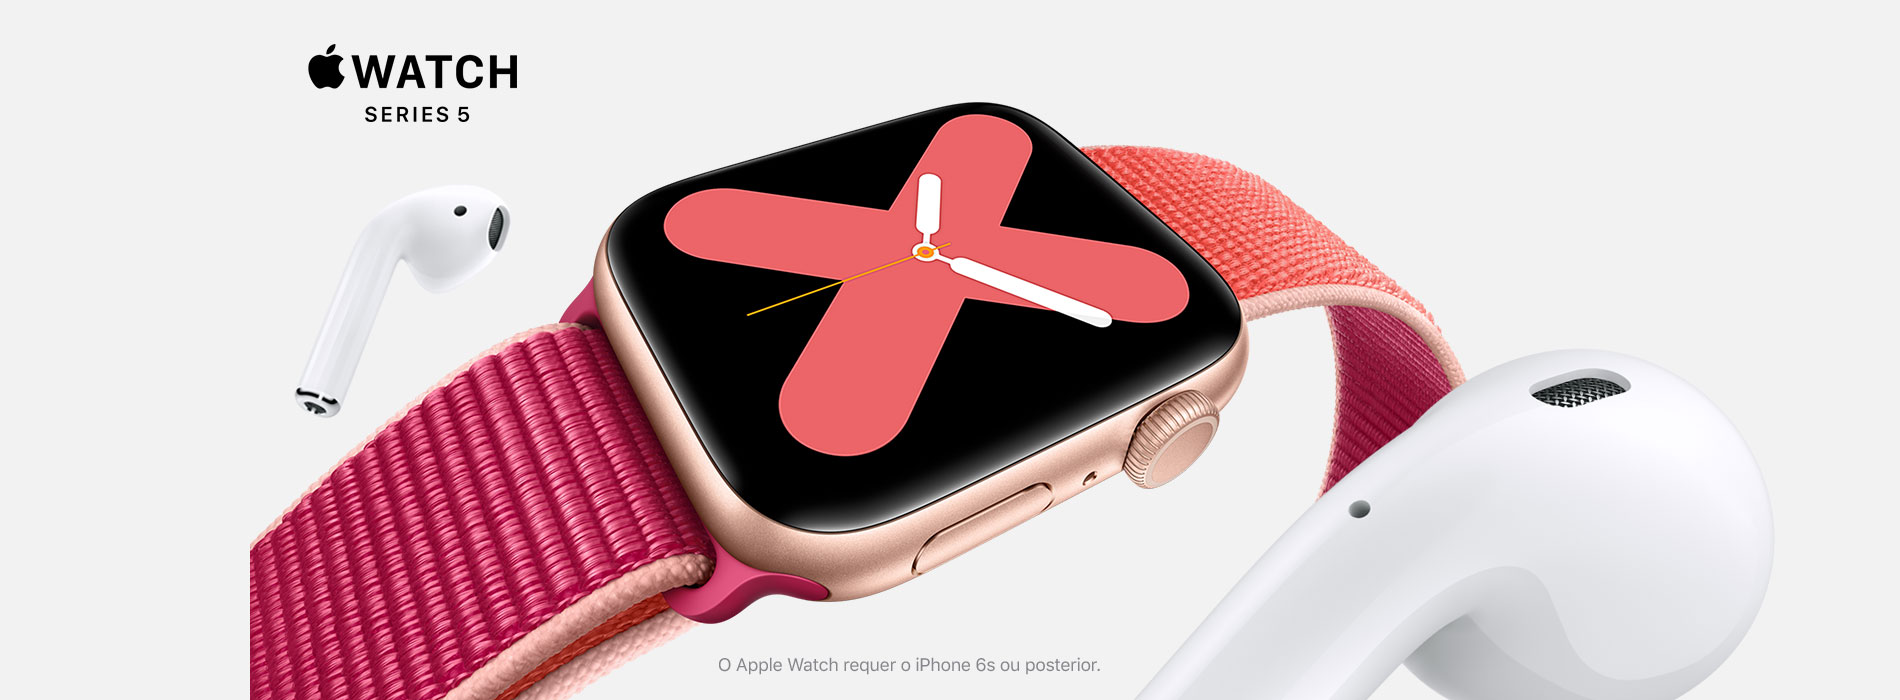 Homepage Slideshow - Apple Watch Serie 5